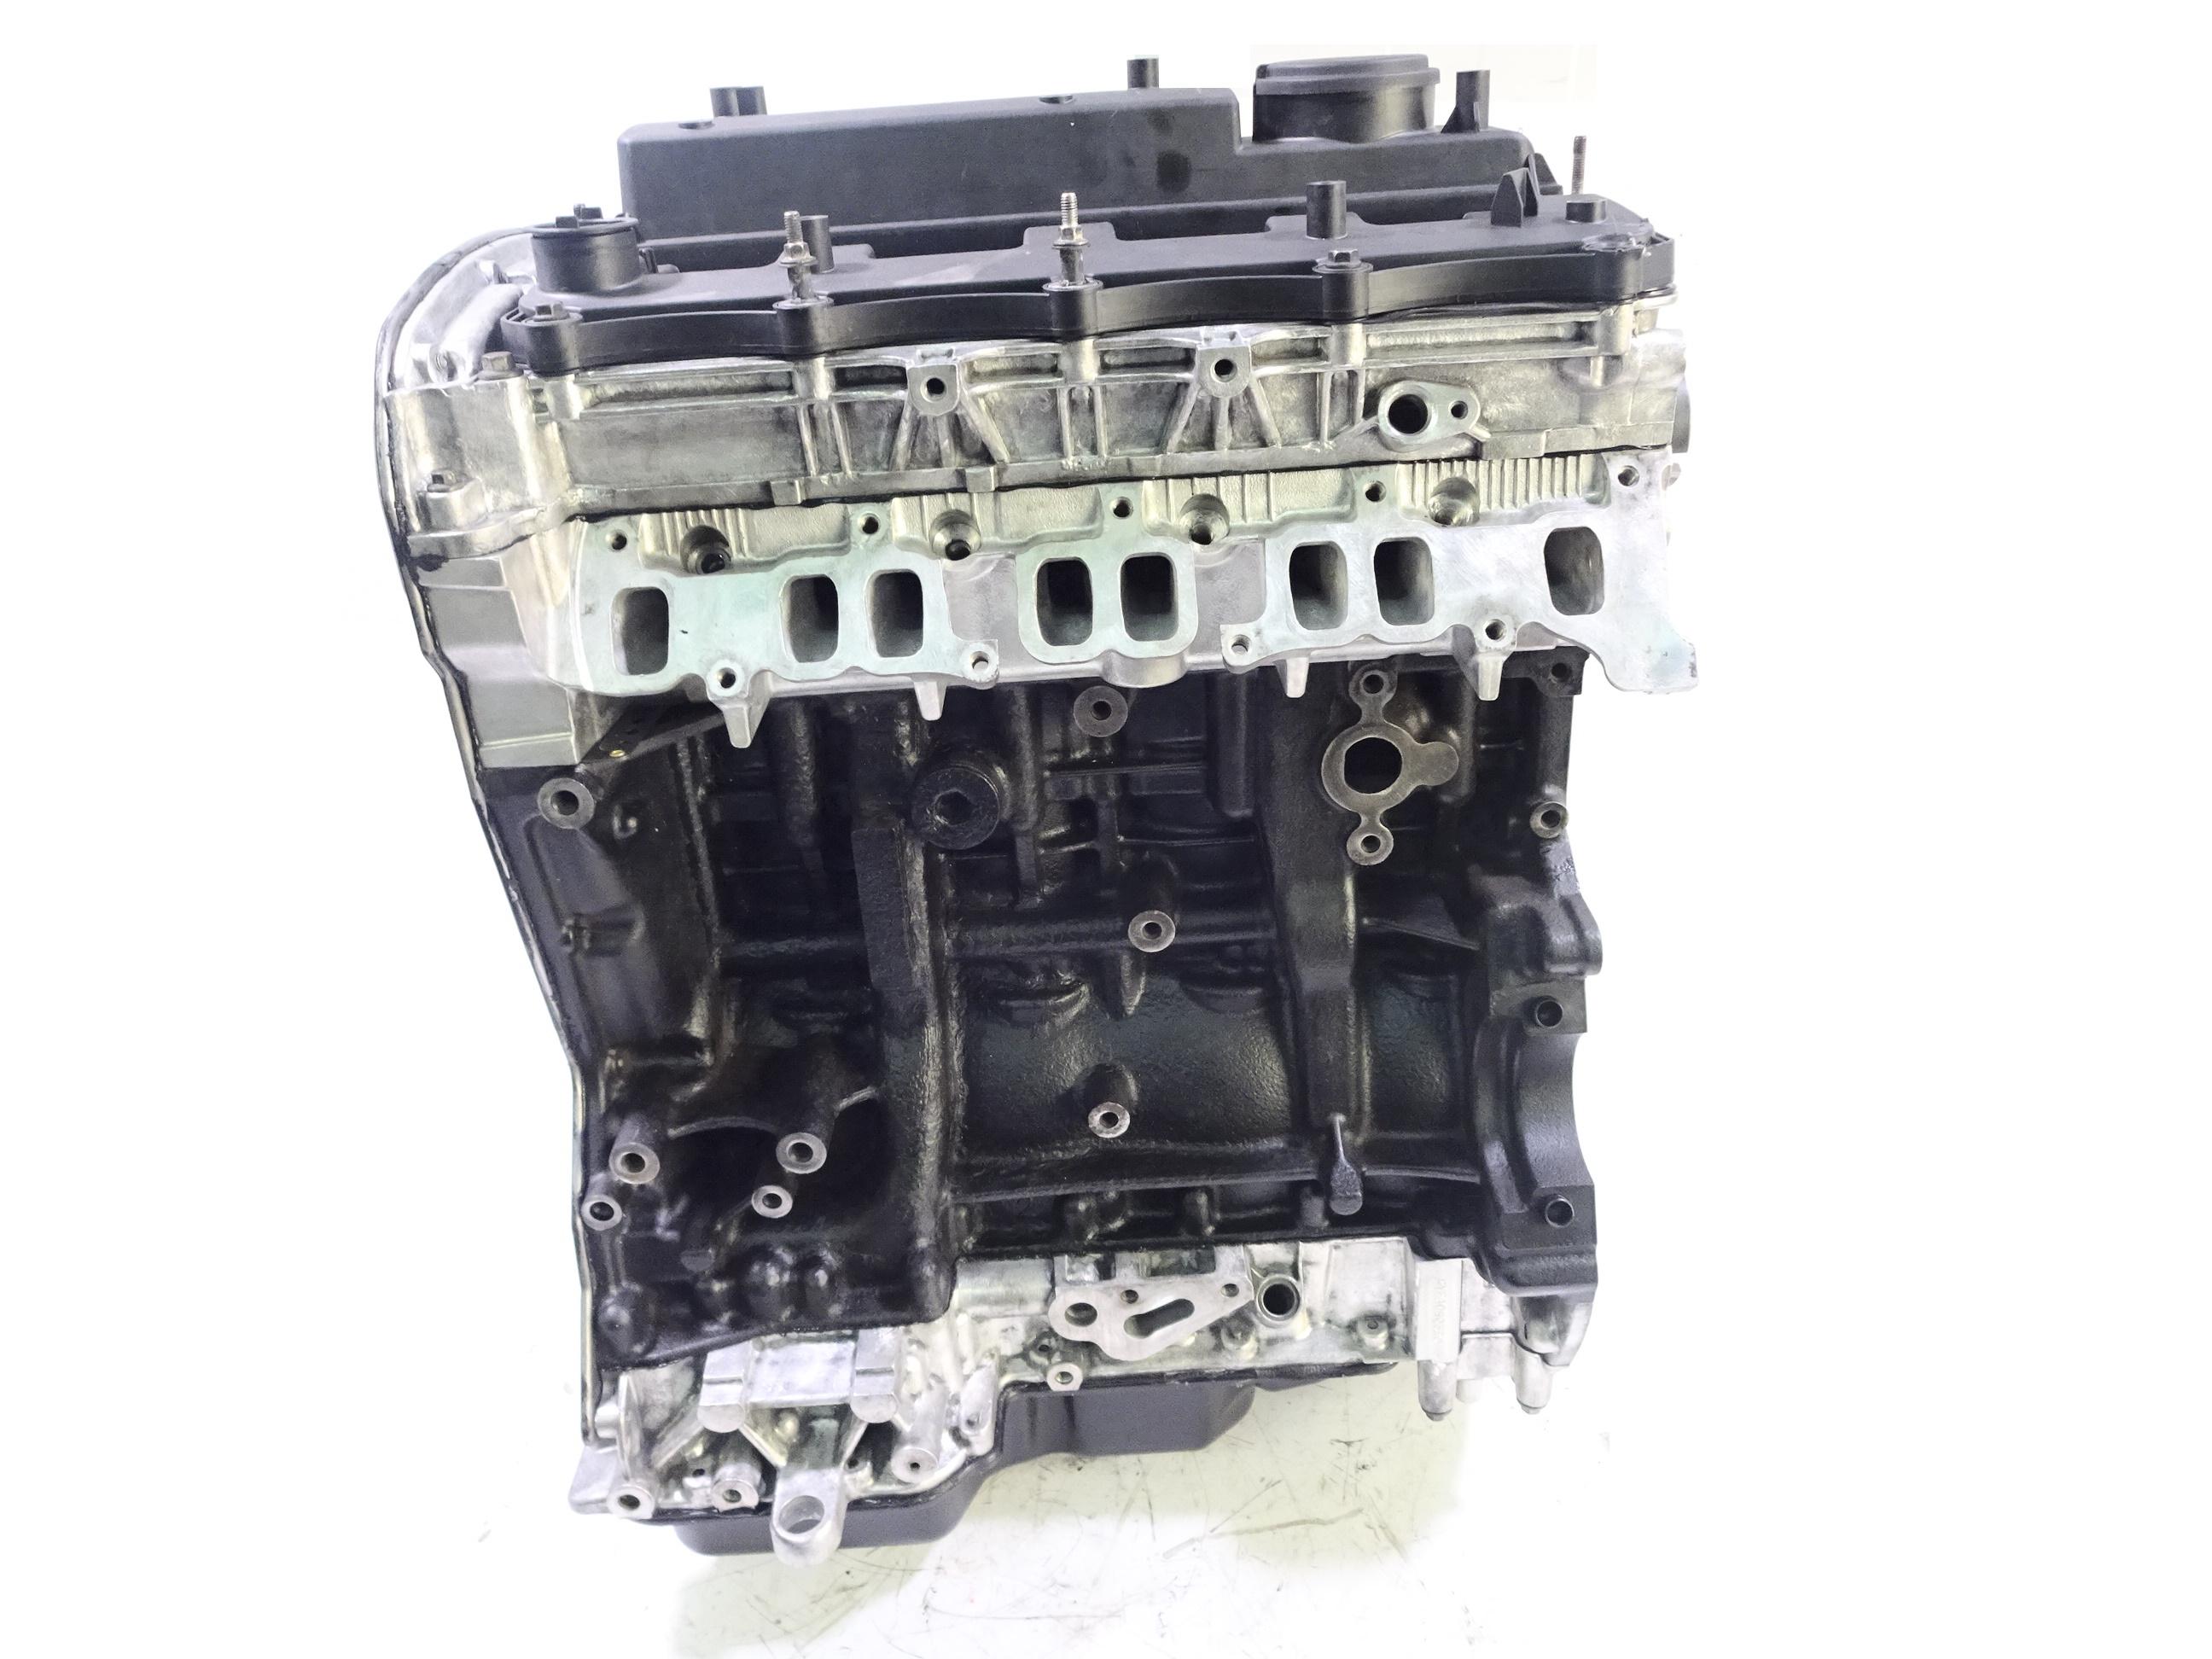 Motor 2008 Ford Transit 2,2 TDCi D Diesel QVFA Kettensatz Dichtung NEU 110 PS